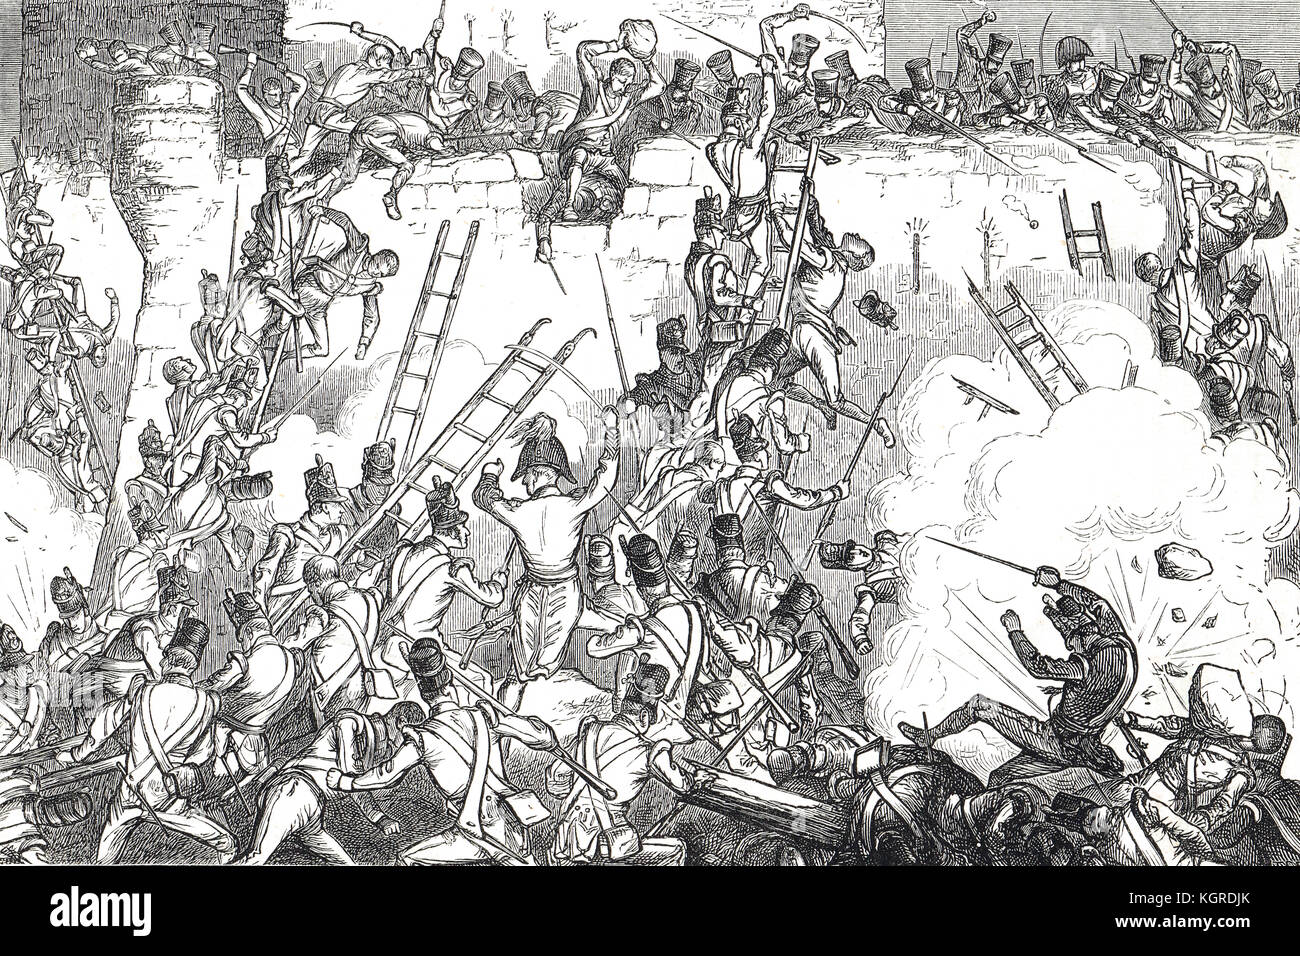 Siege of Badajoz, The storming of Badajoz, Spain, 1812 - Stock Image